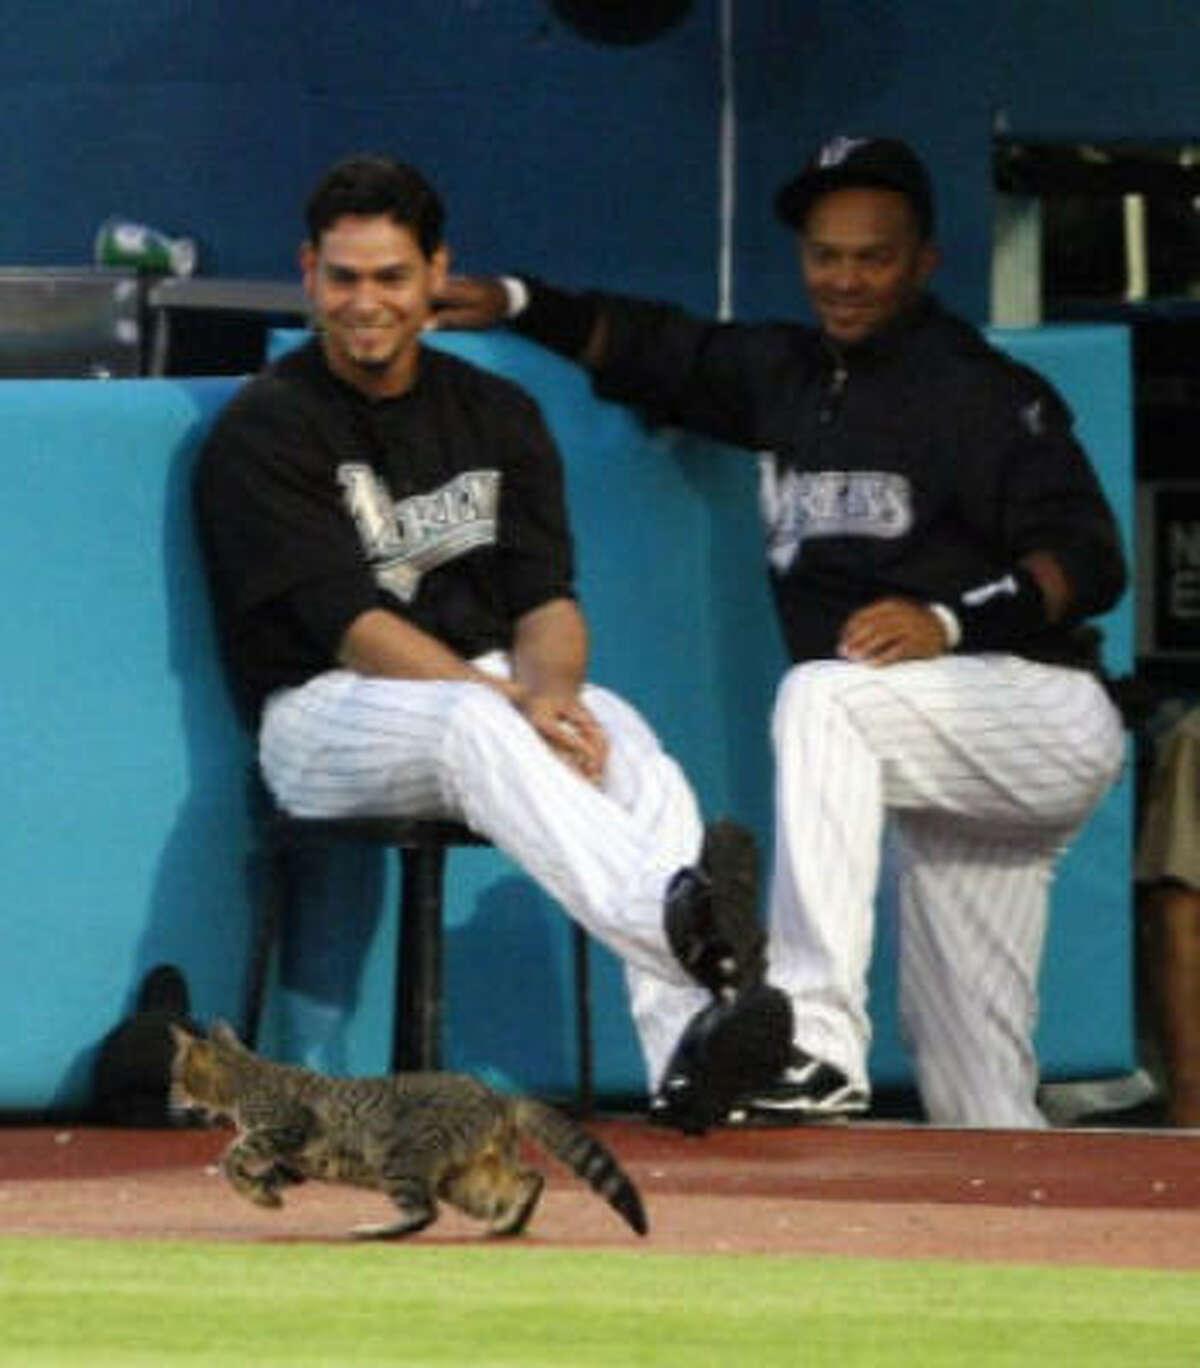 Anibal Sanchez, left, and Emilio Bonifacio don't seem disturbed by the cat sighting.